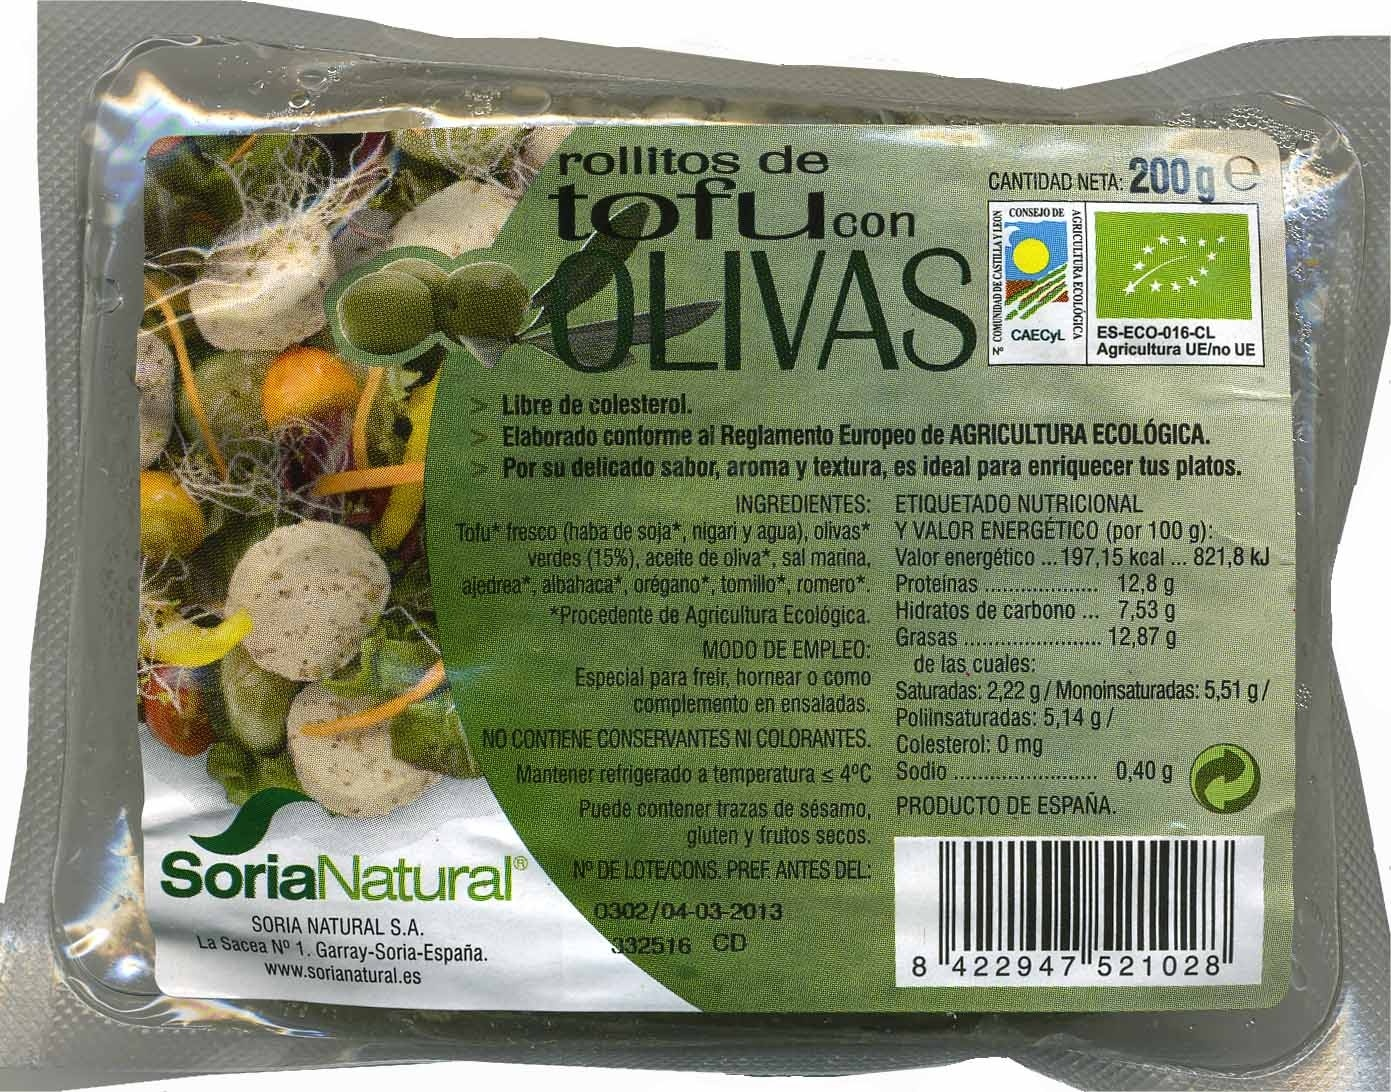 Rollitos de tofu con olivas - Product - es